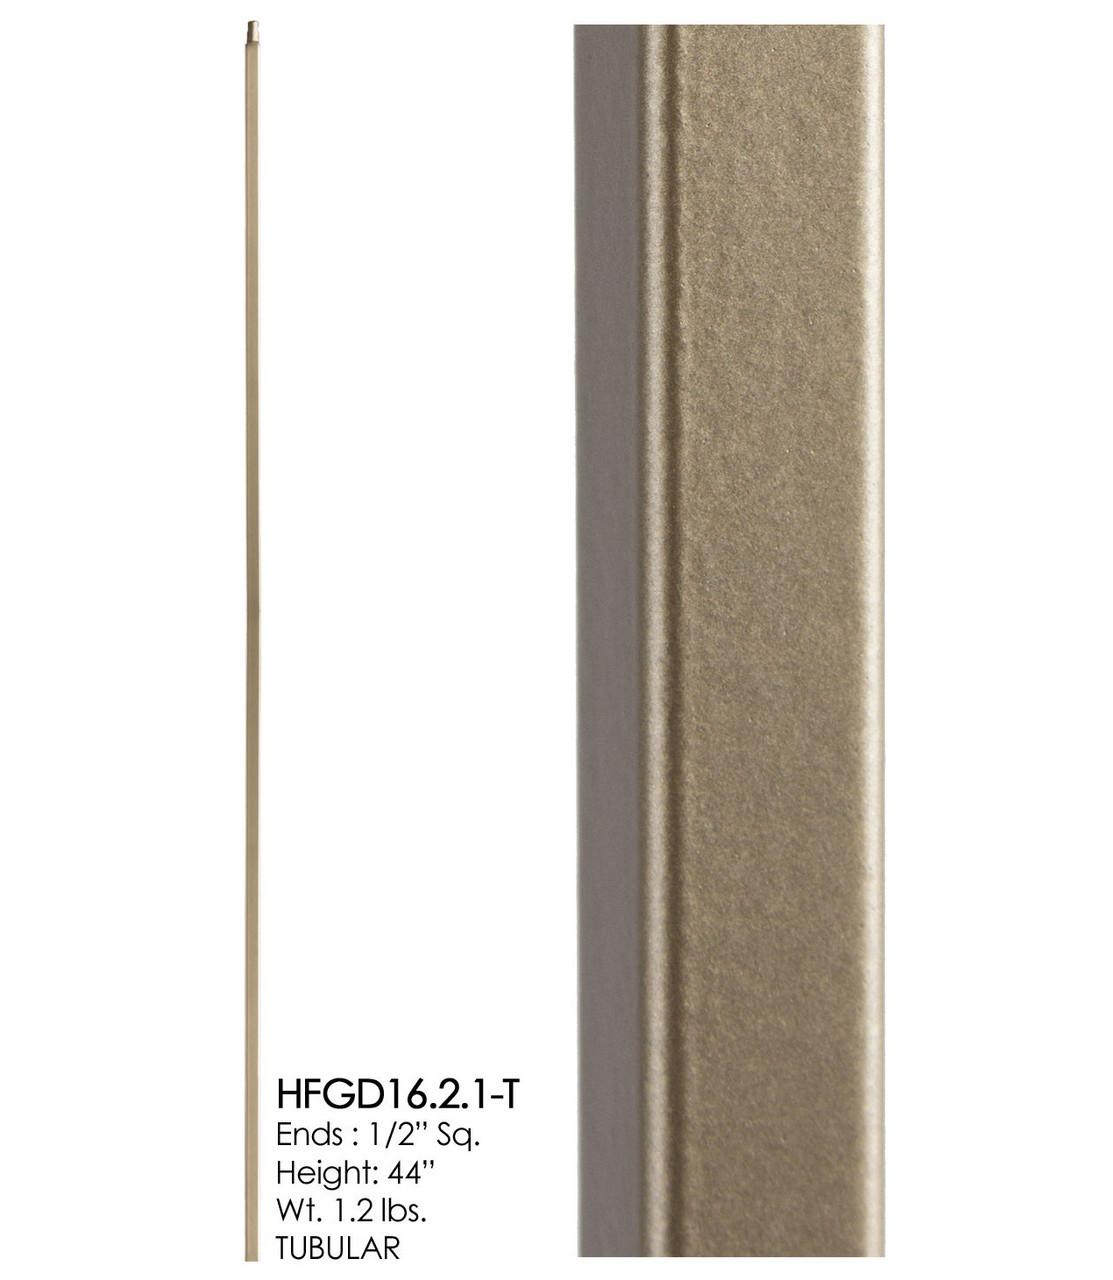 HF16.2.1-T Plain Square Bar Tubular Steel, Dorado Gold